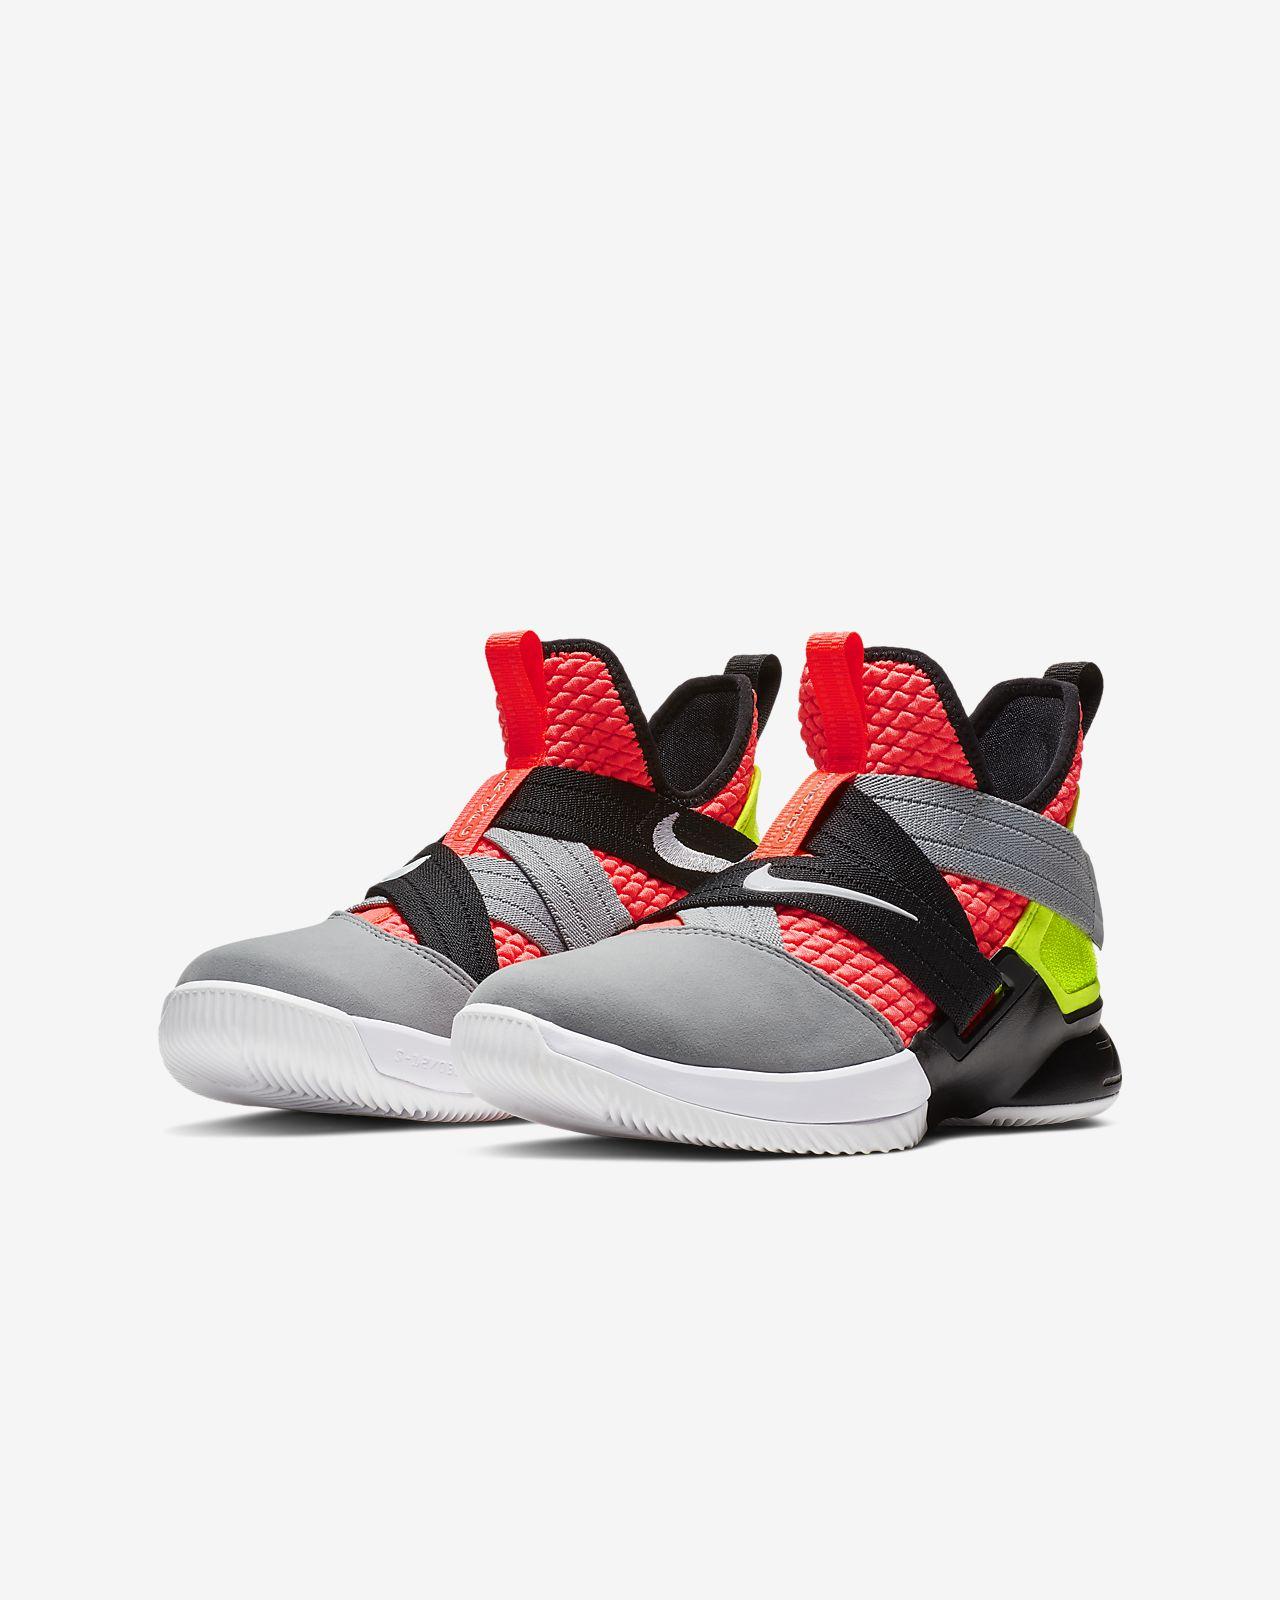 039ac3154c4 LeBron Soldier 12 SFG Big Kids  Basketball Shoe. Nike.com